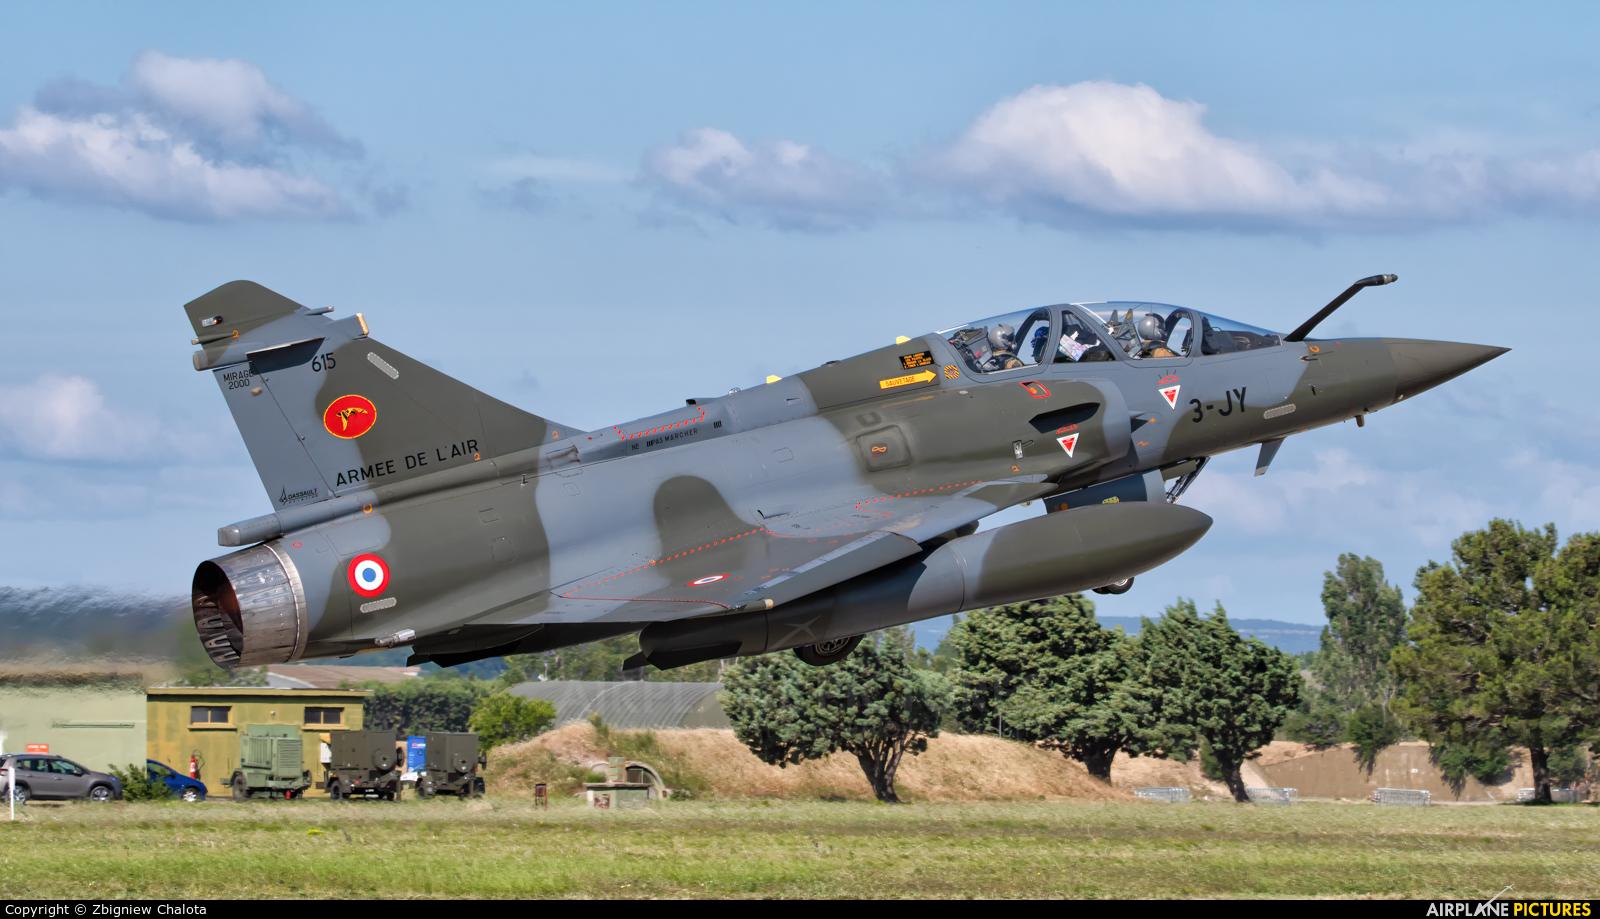 France - Air Force 3-JY aircraft at Orange - Caritat